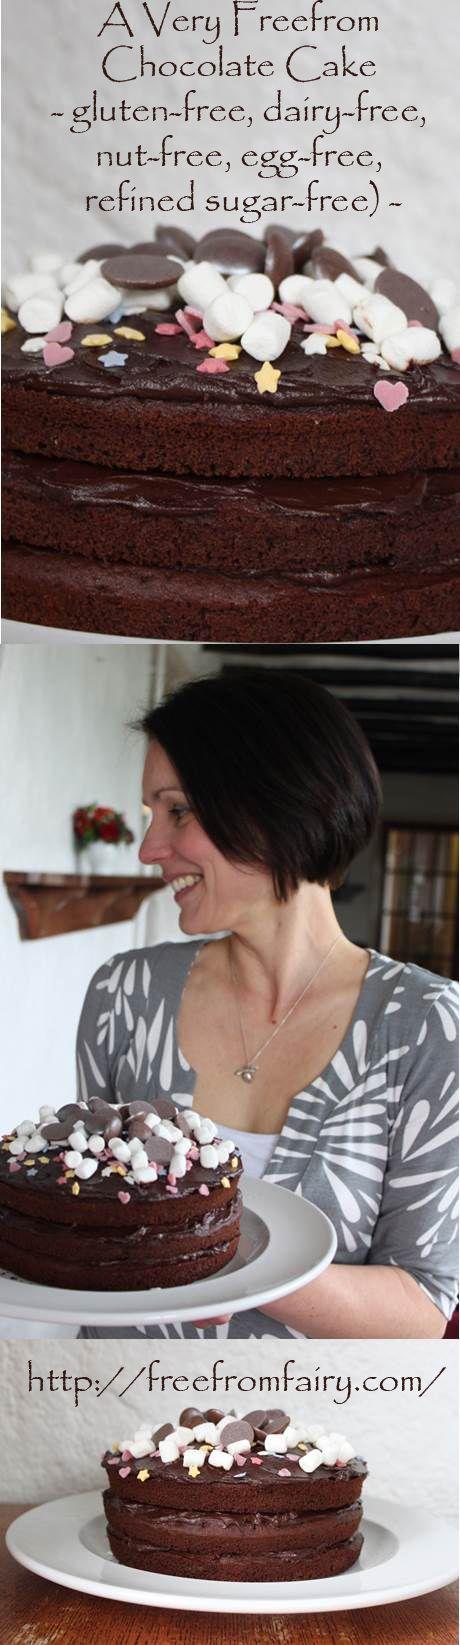 A very freefrom chocolate cake...glutenfree, dairyfree, eggfree, nutfree, soyafree, refined sugar free!